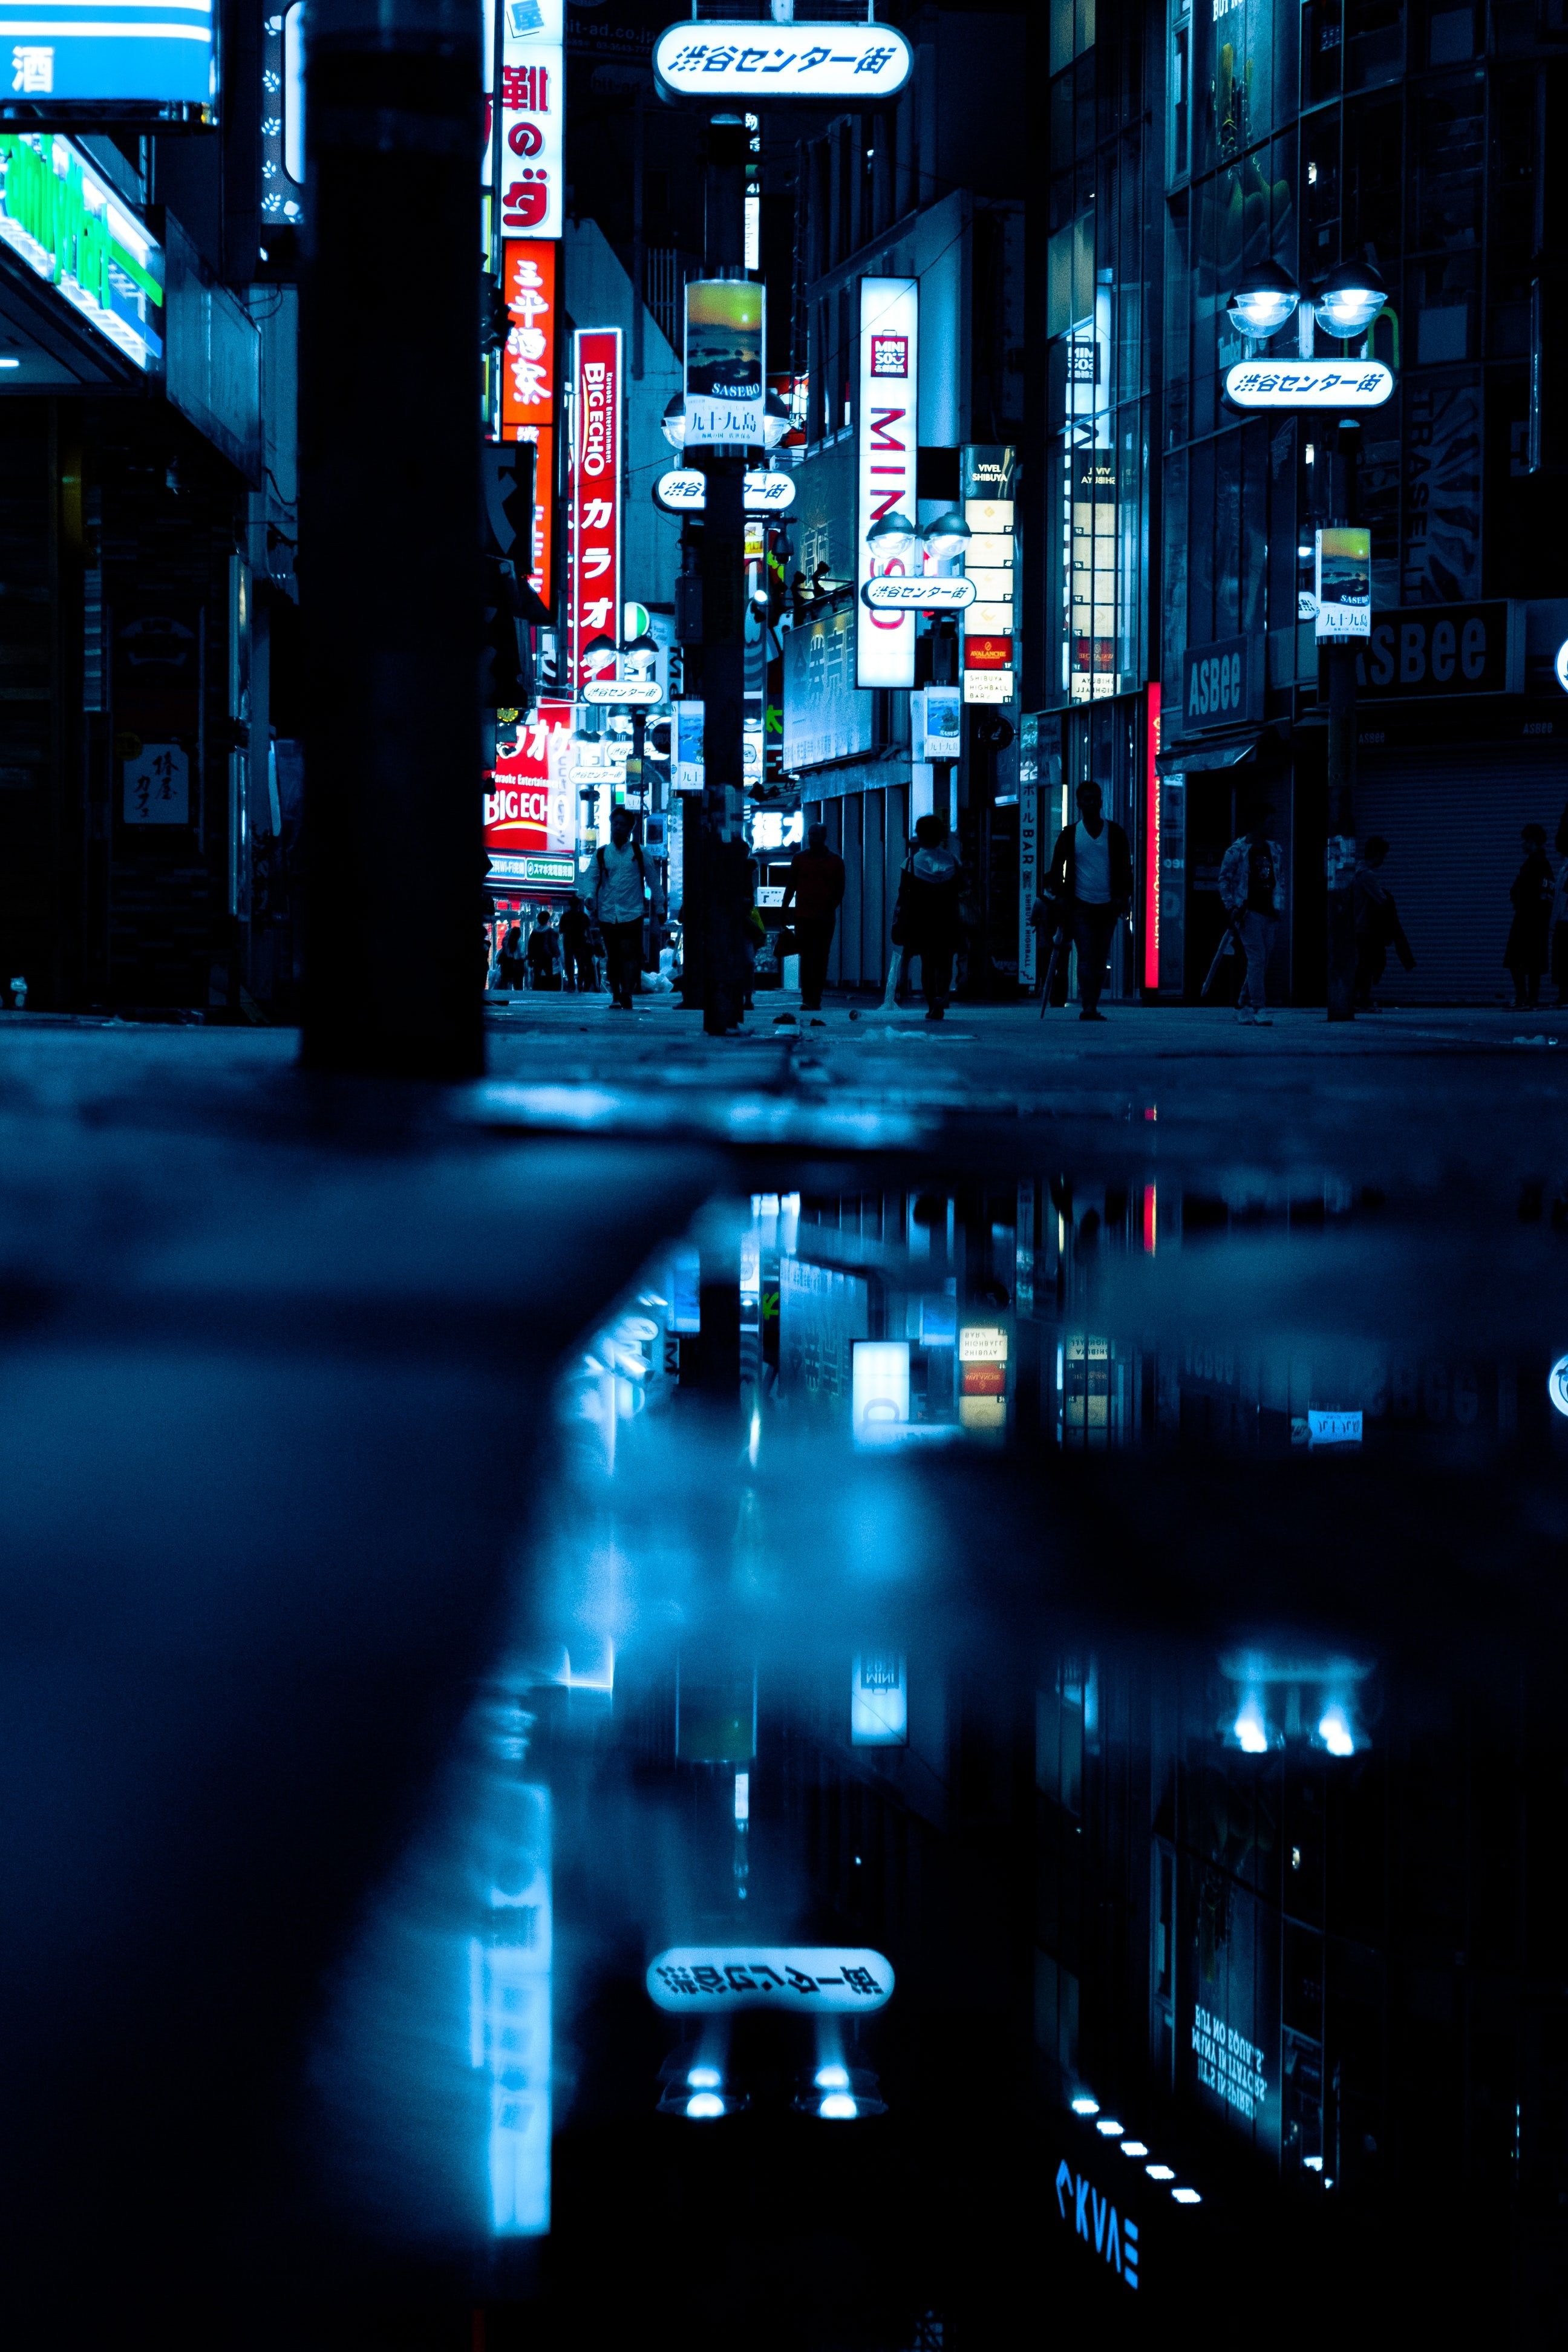 Reflection Of City Night Lights City Lights At Night Night City City Aesthetic